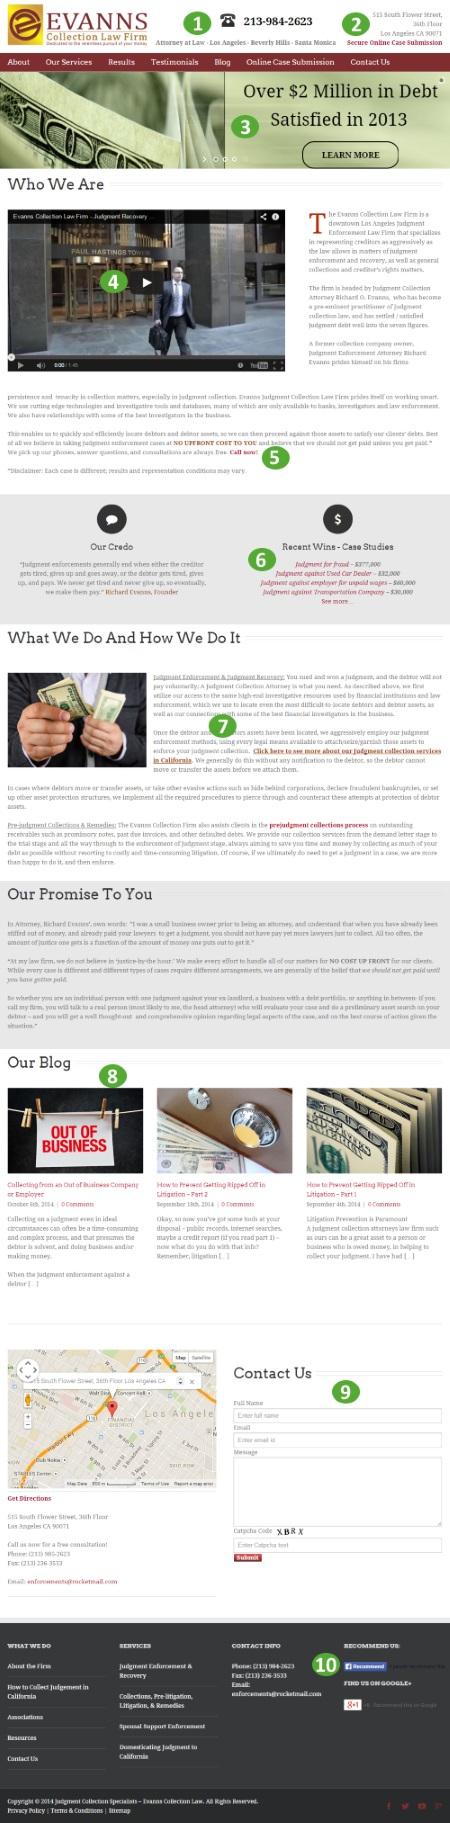 law-firm-website-design-case-study